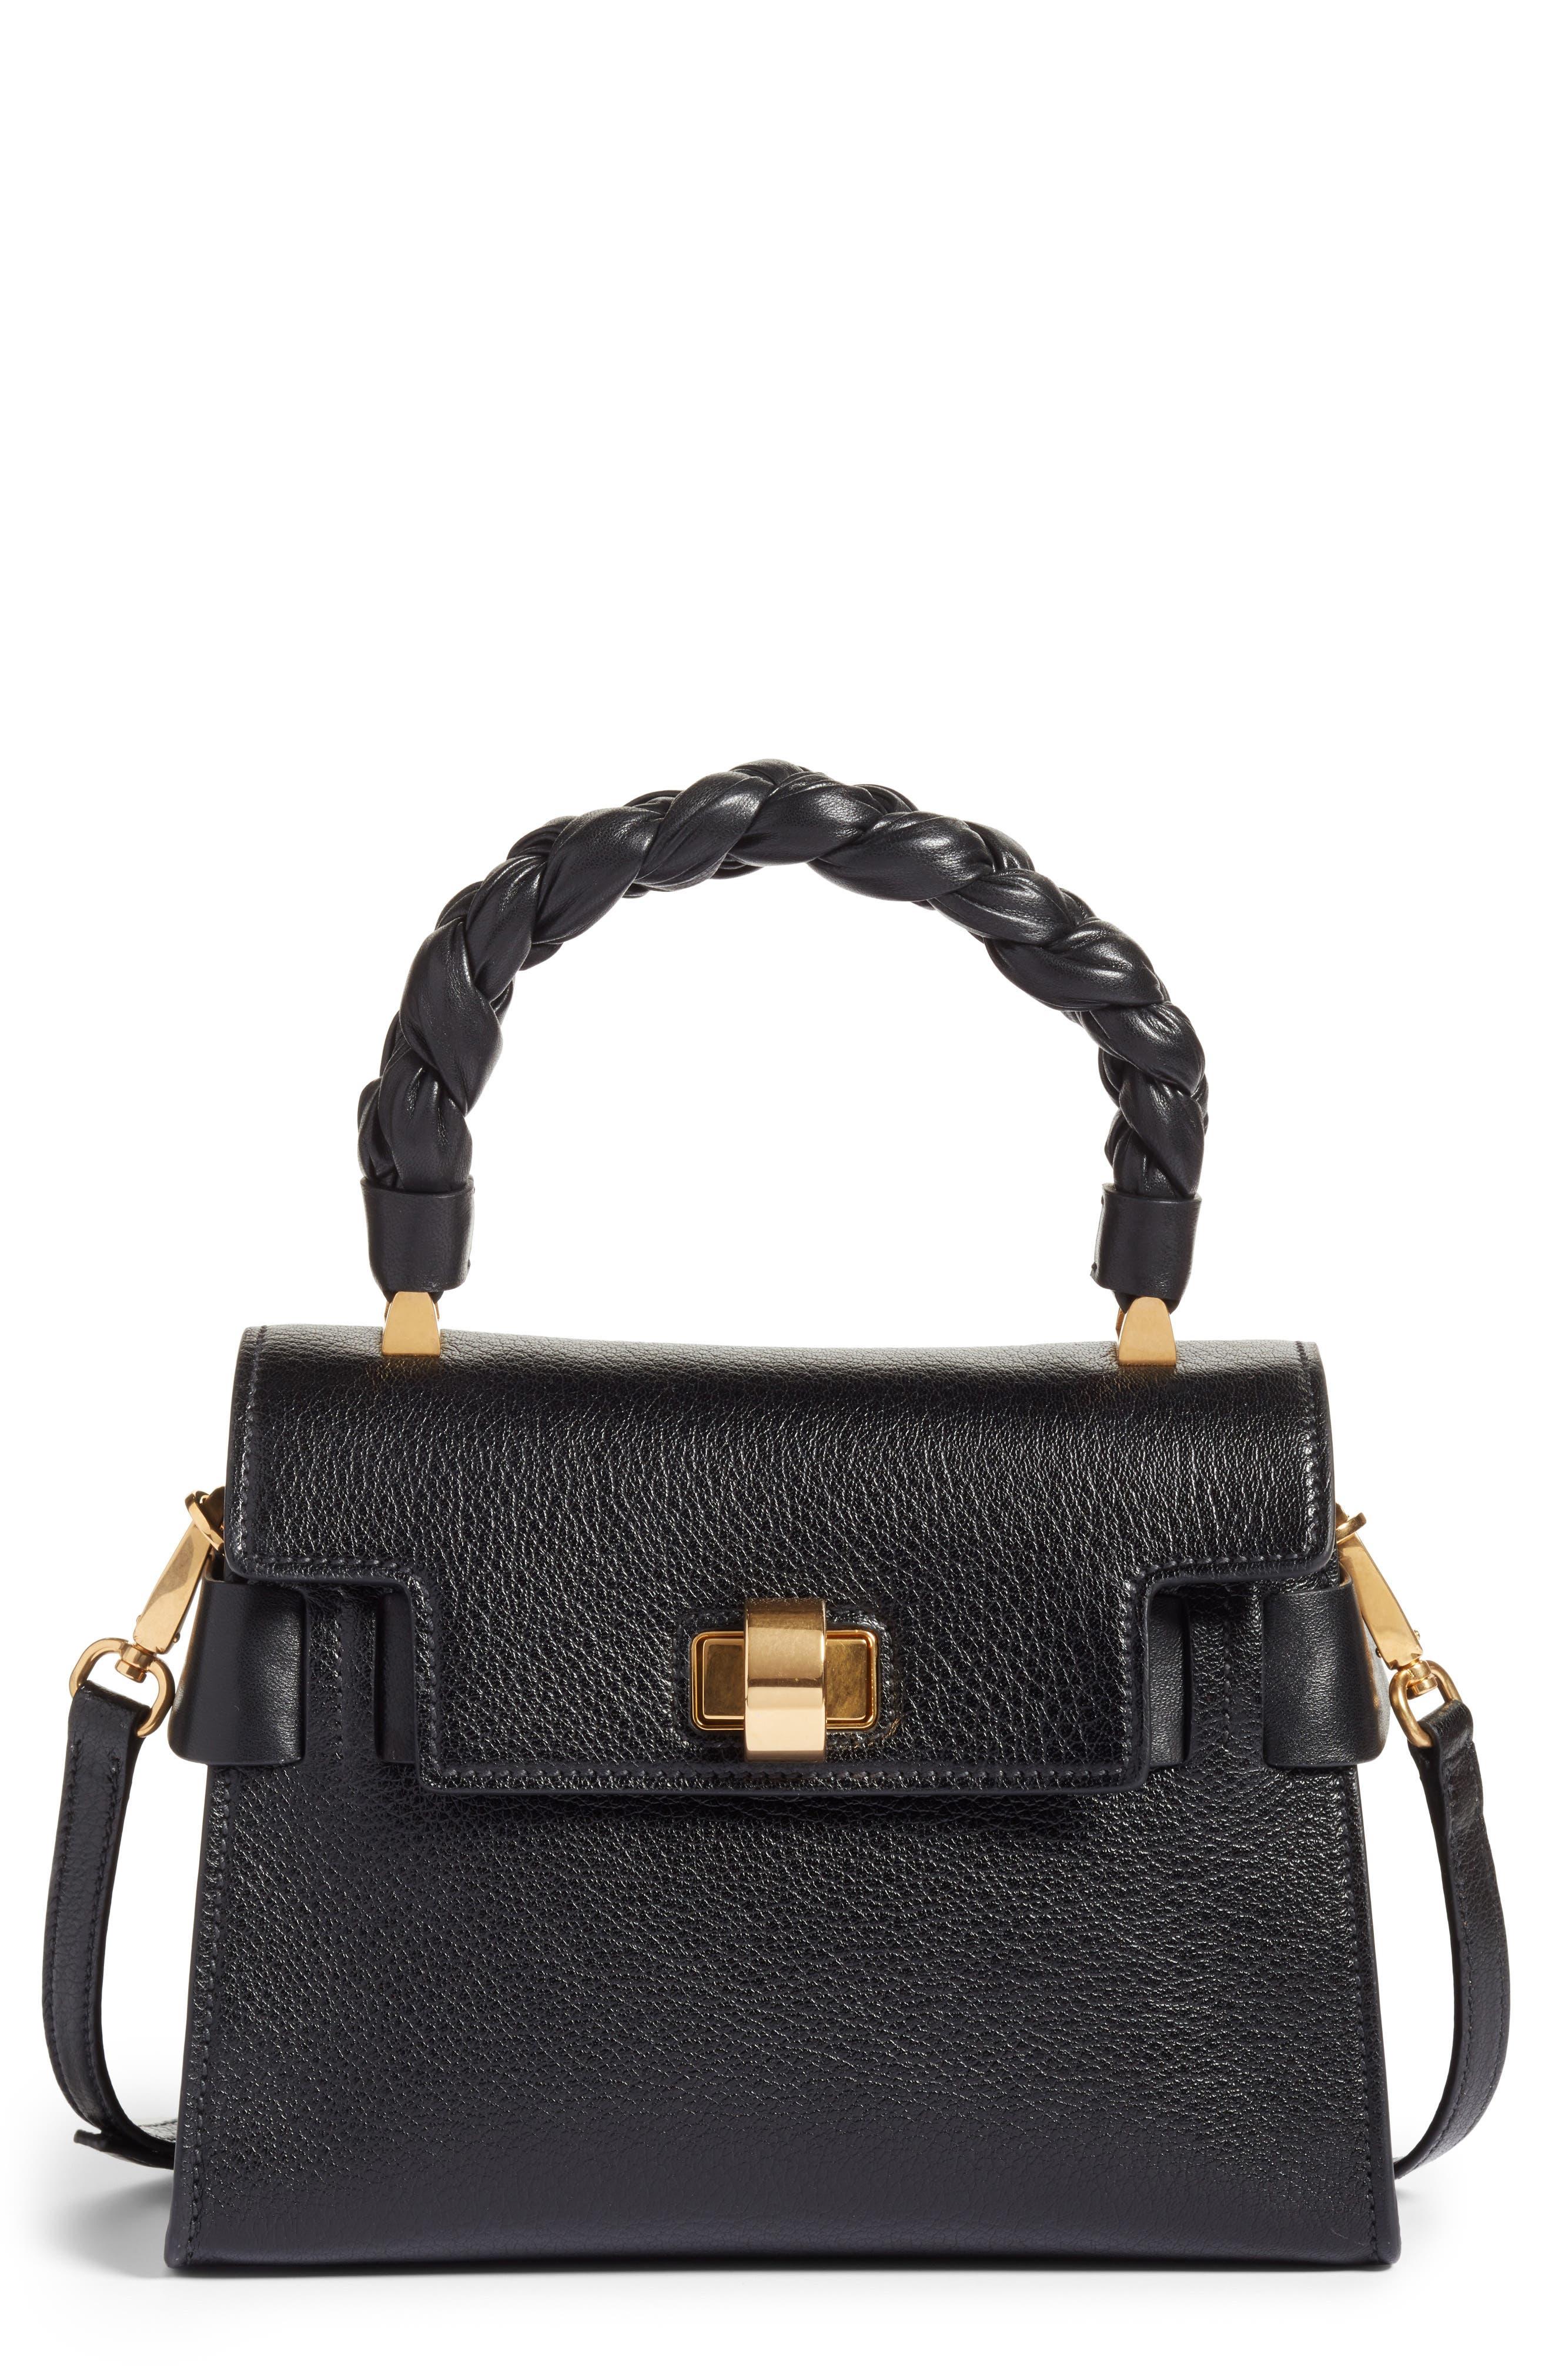 Miu Miu Madras Leather Top Handle Satchel